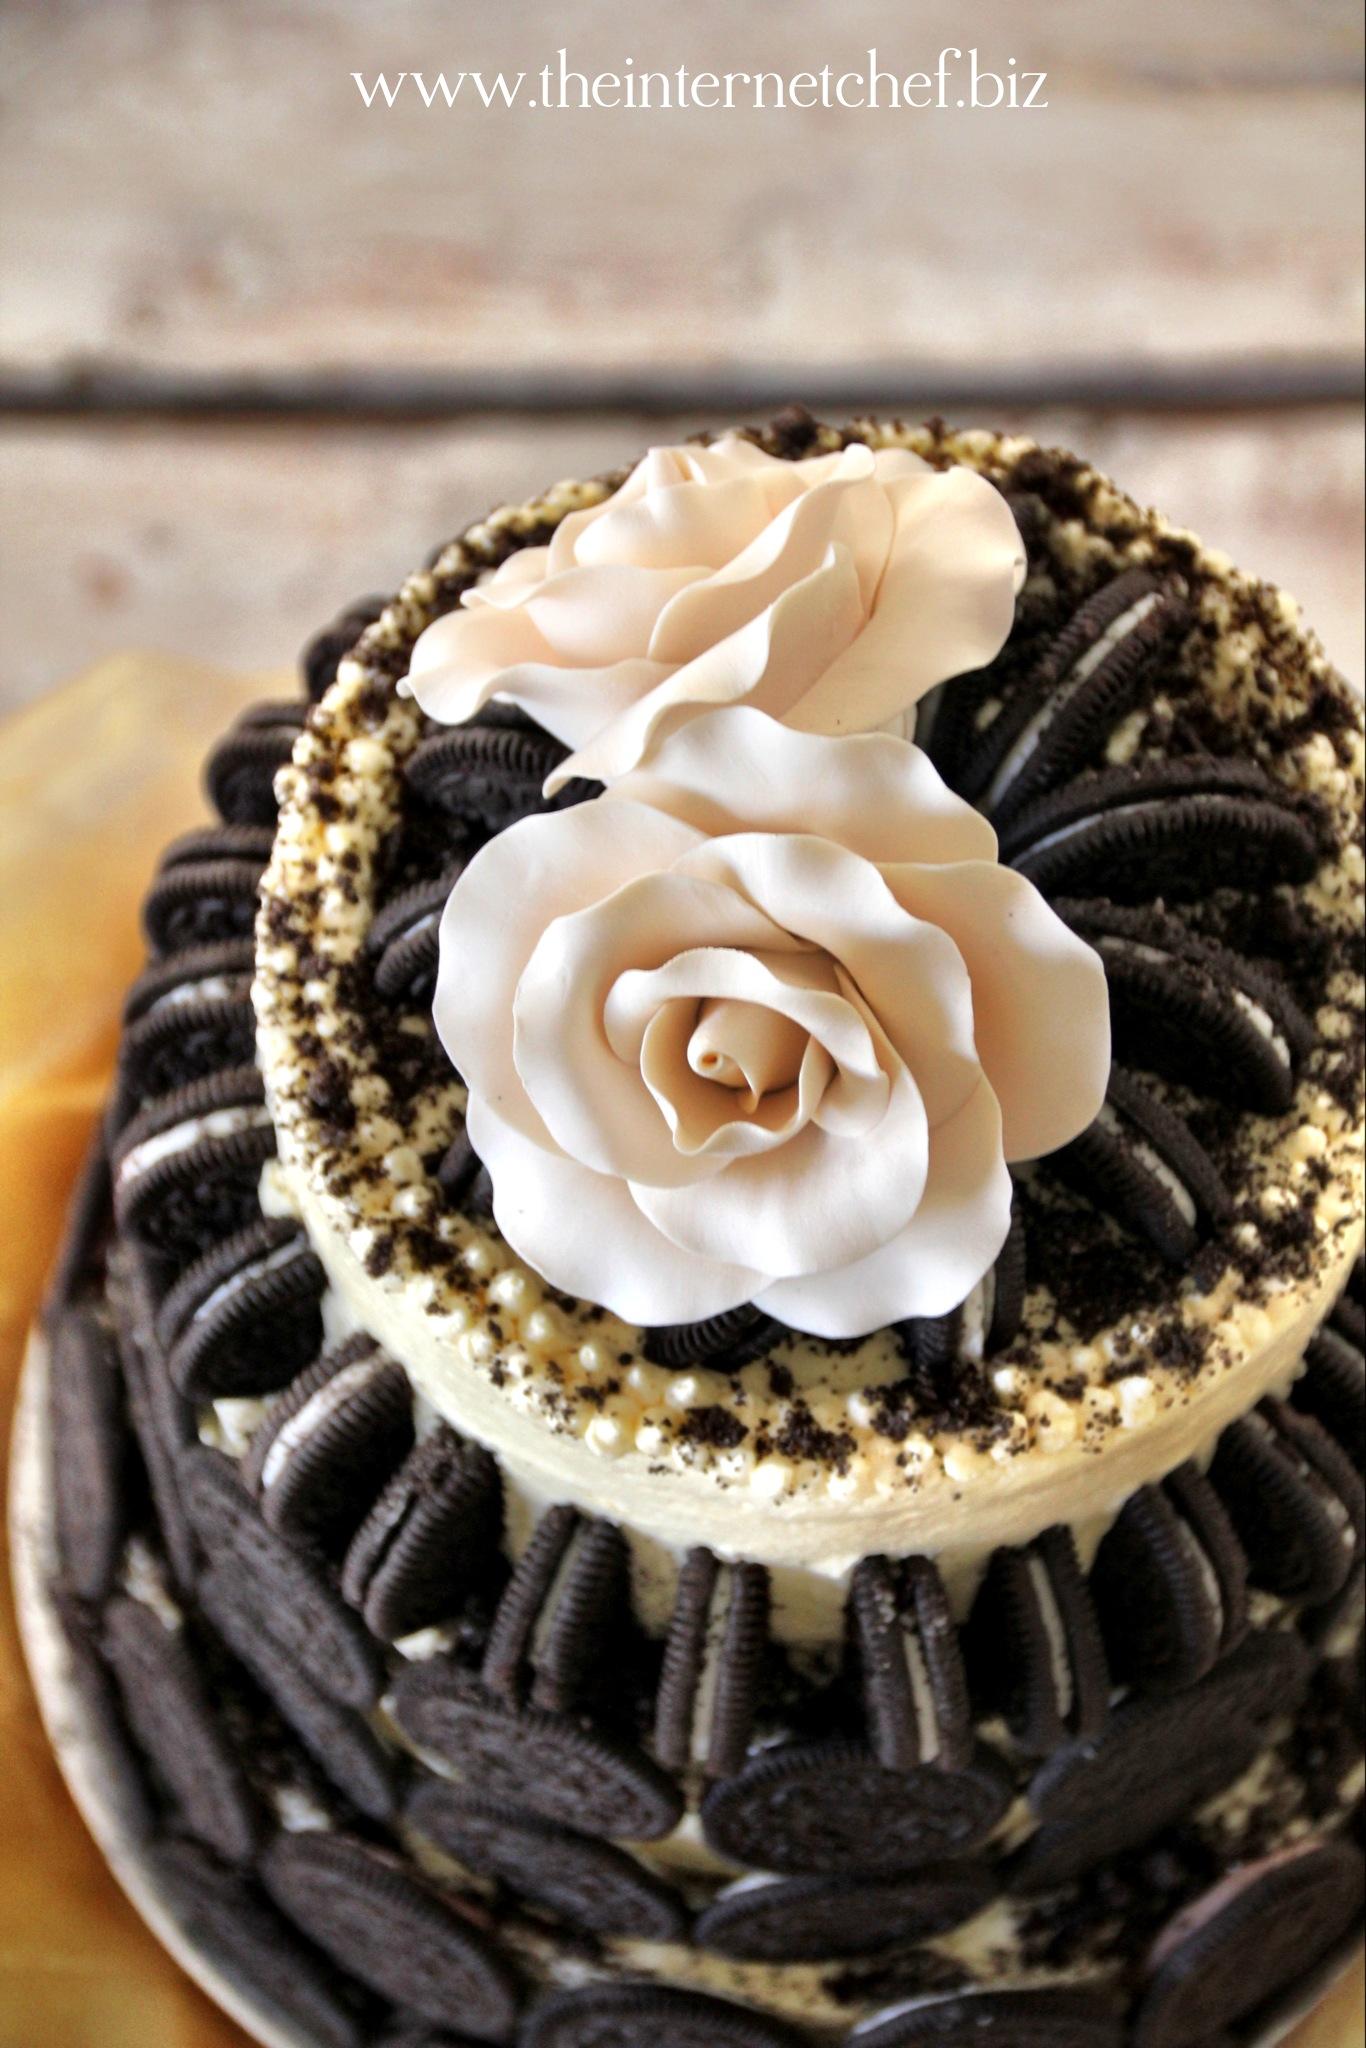 Meet The Oreo Cookie Amp Toblerone Wedding Cake The